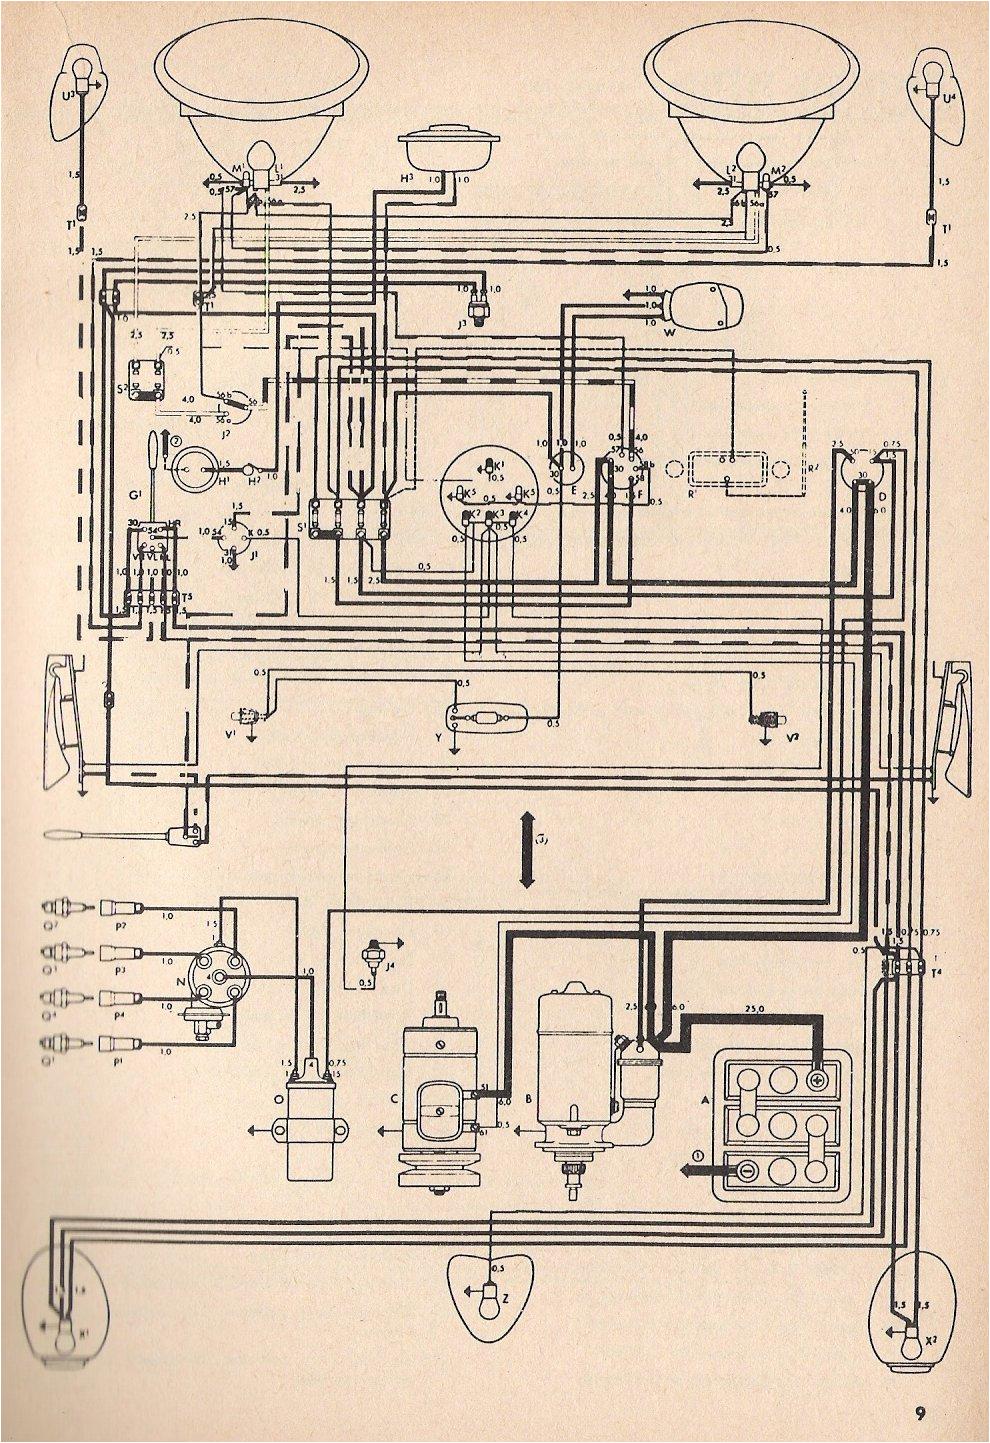 beetle wiring diagram wiring diagram structure thesamba com type 1 wiring diagrams beetle wiring diagram 1971